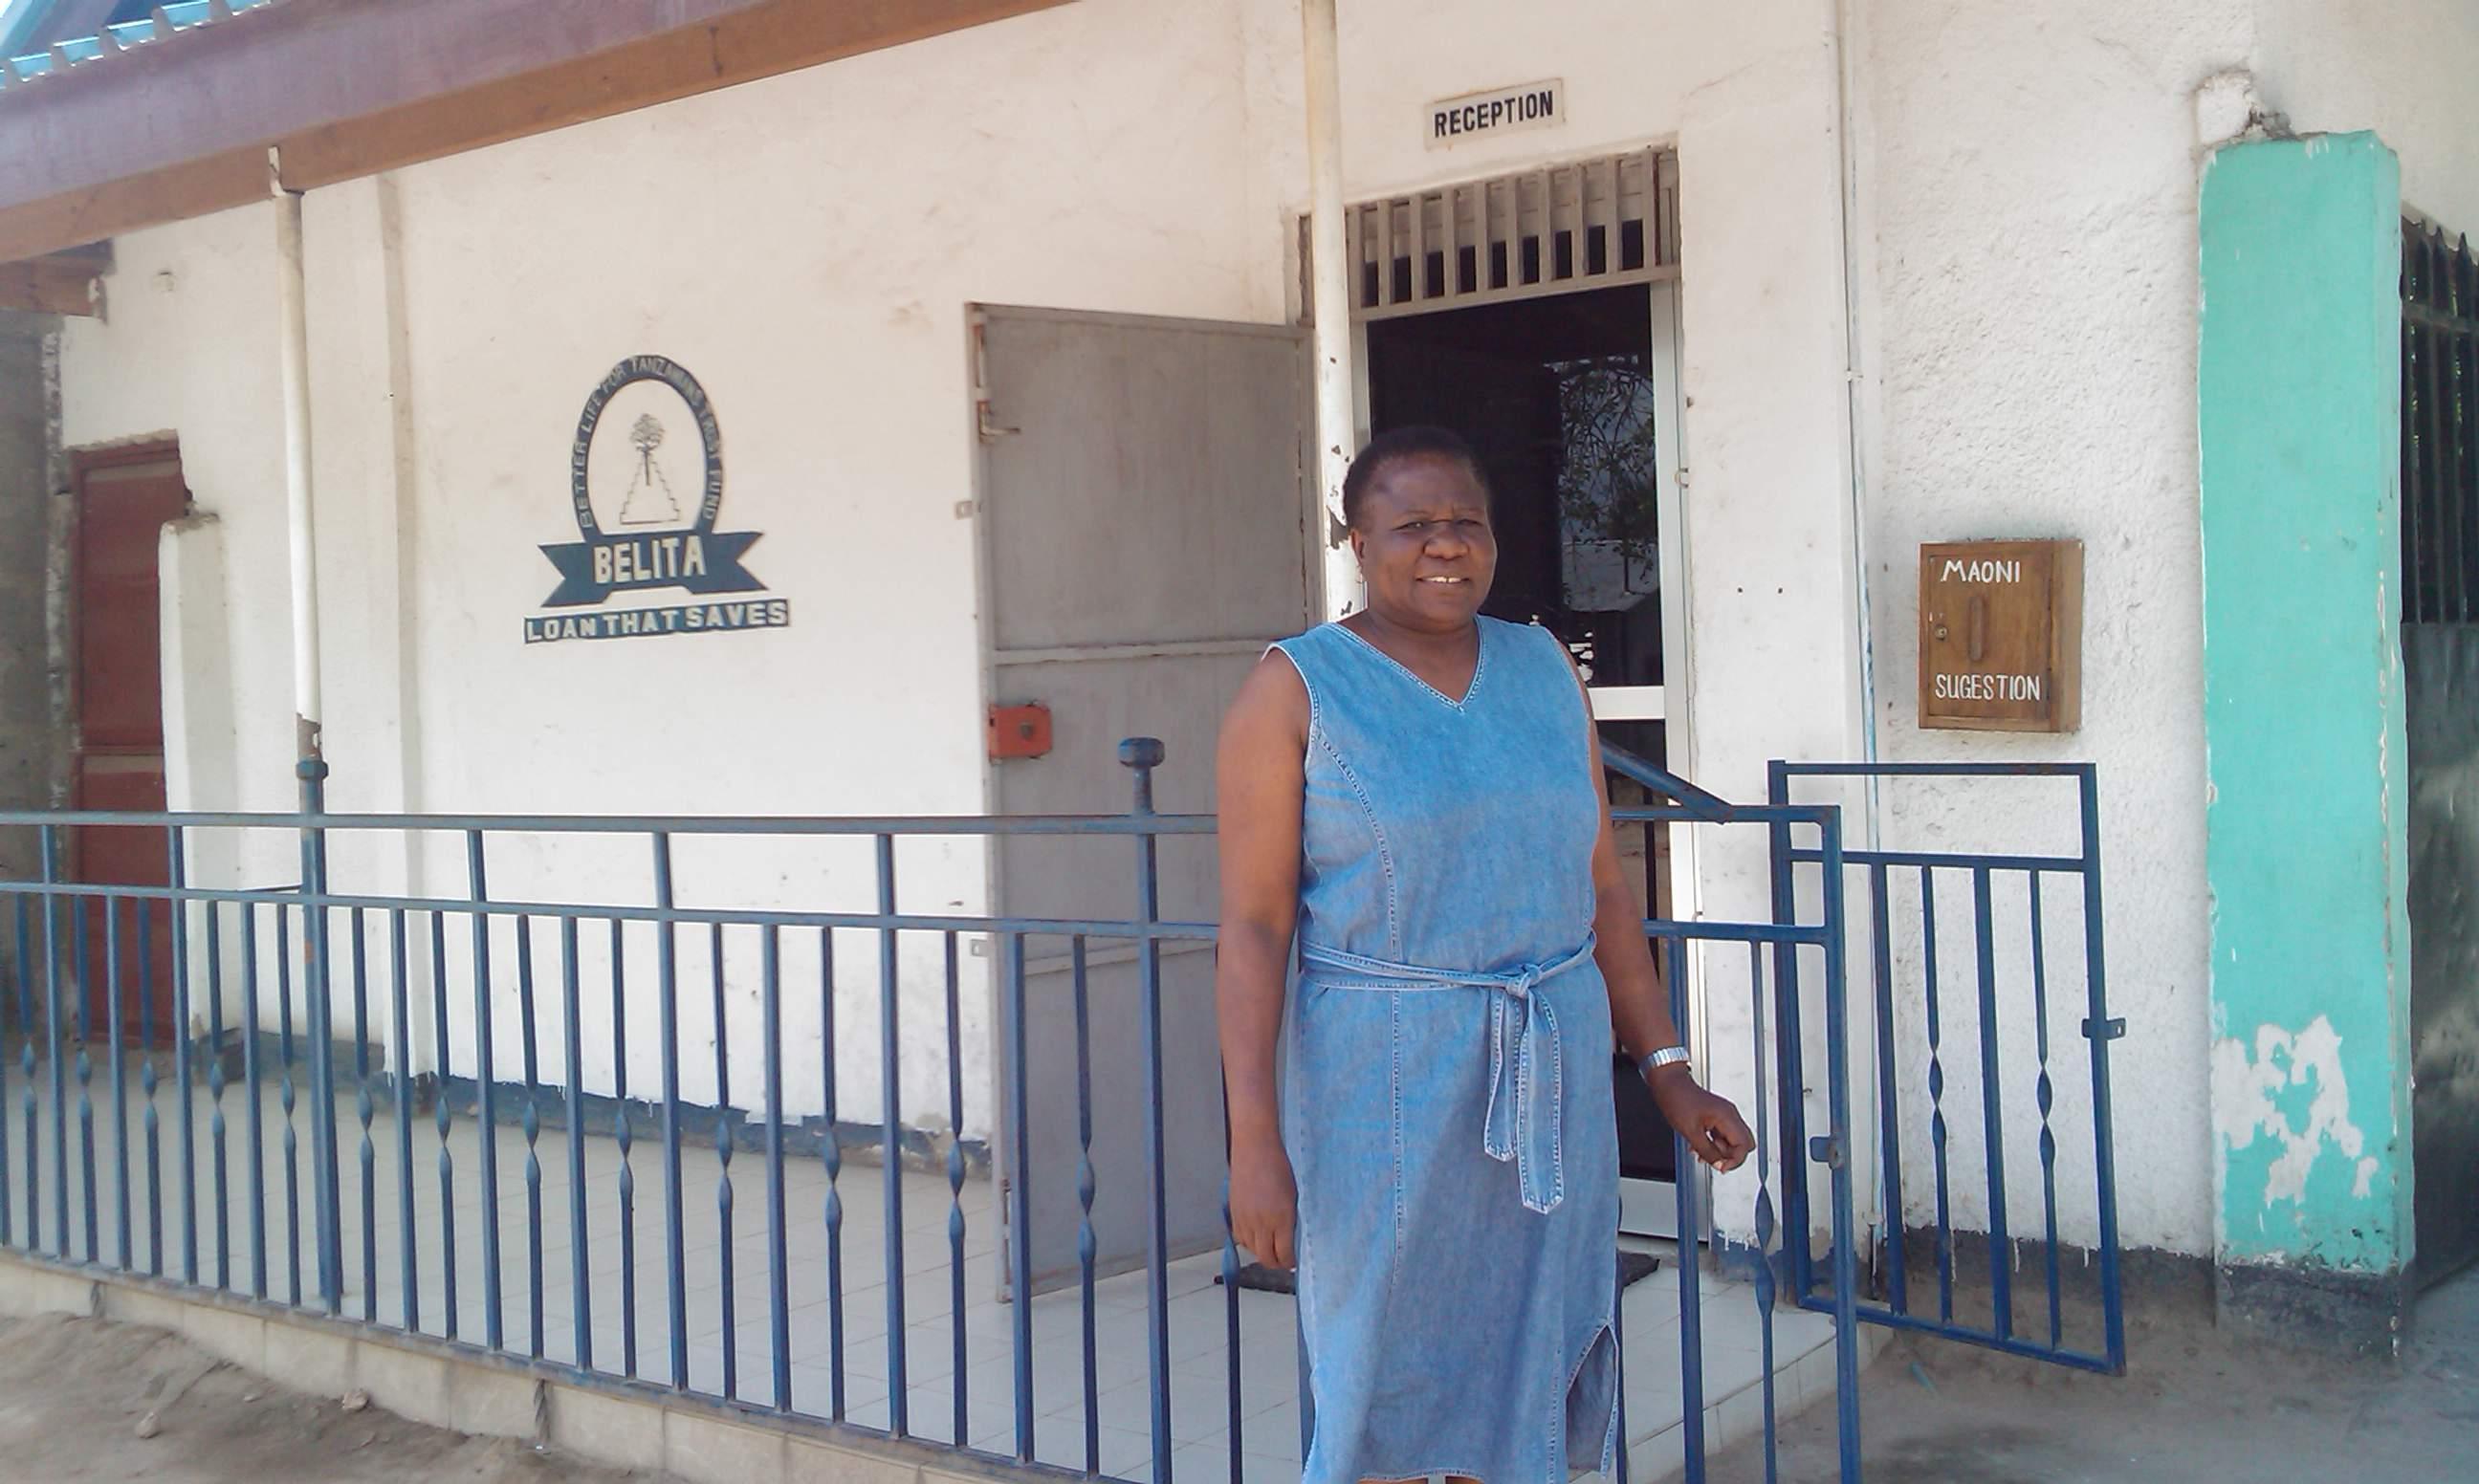 Helena, the BELITA founder, standing in front of the servant's quarter's old BELITA office.